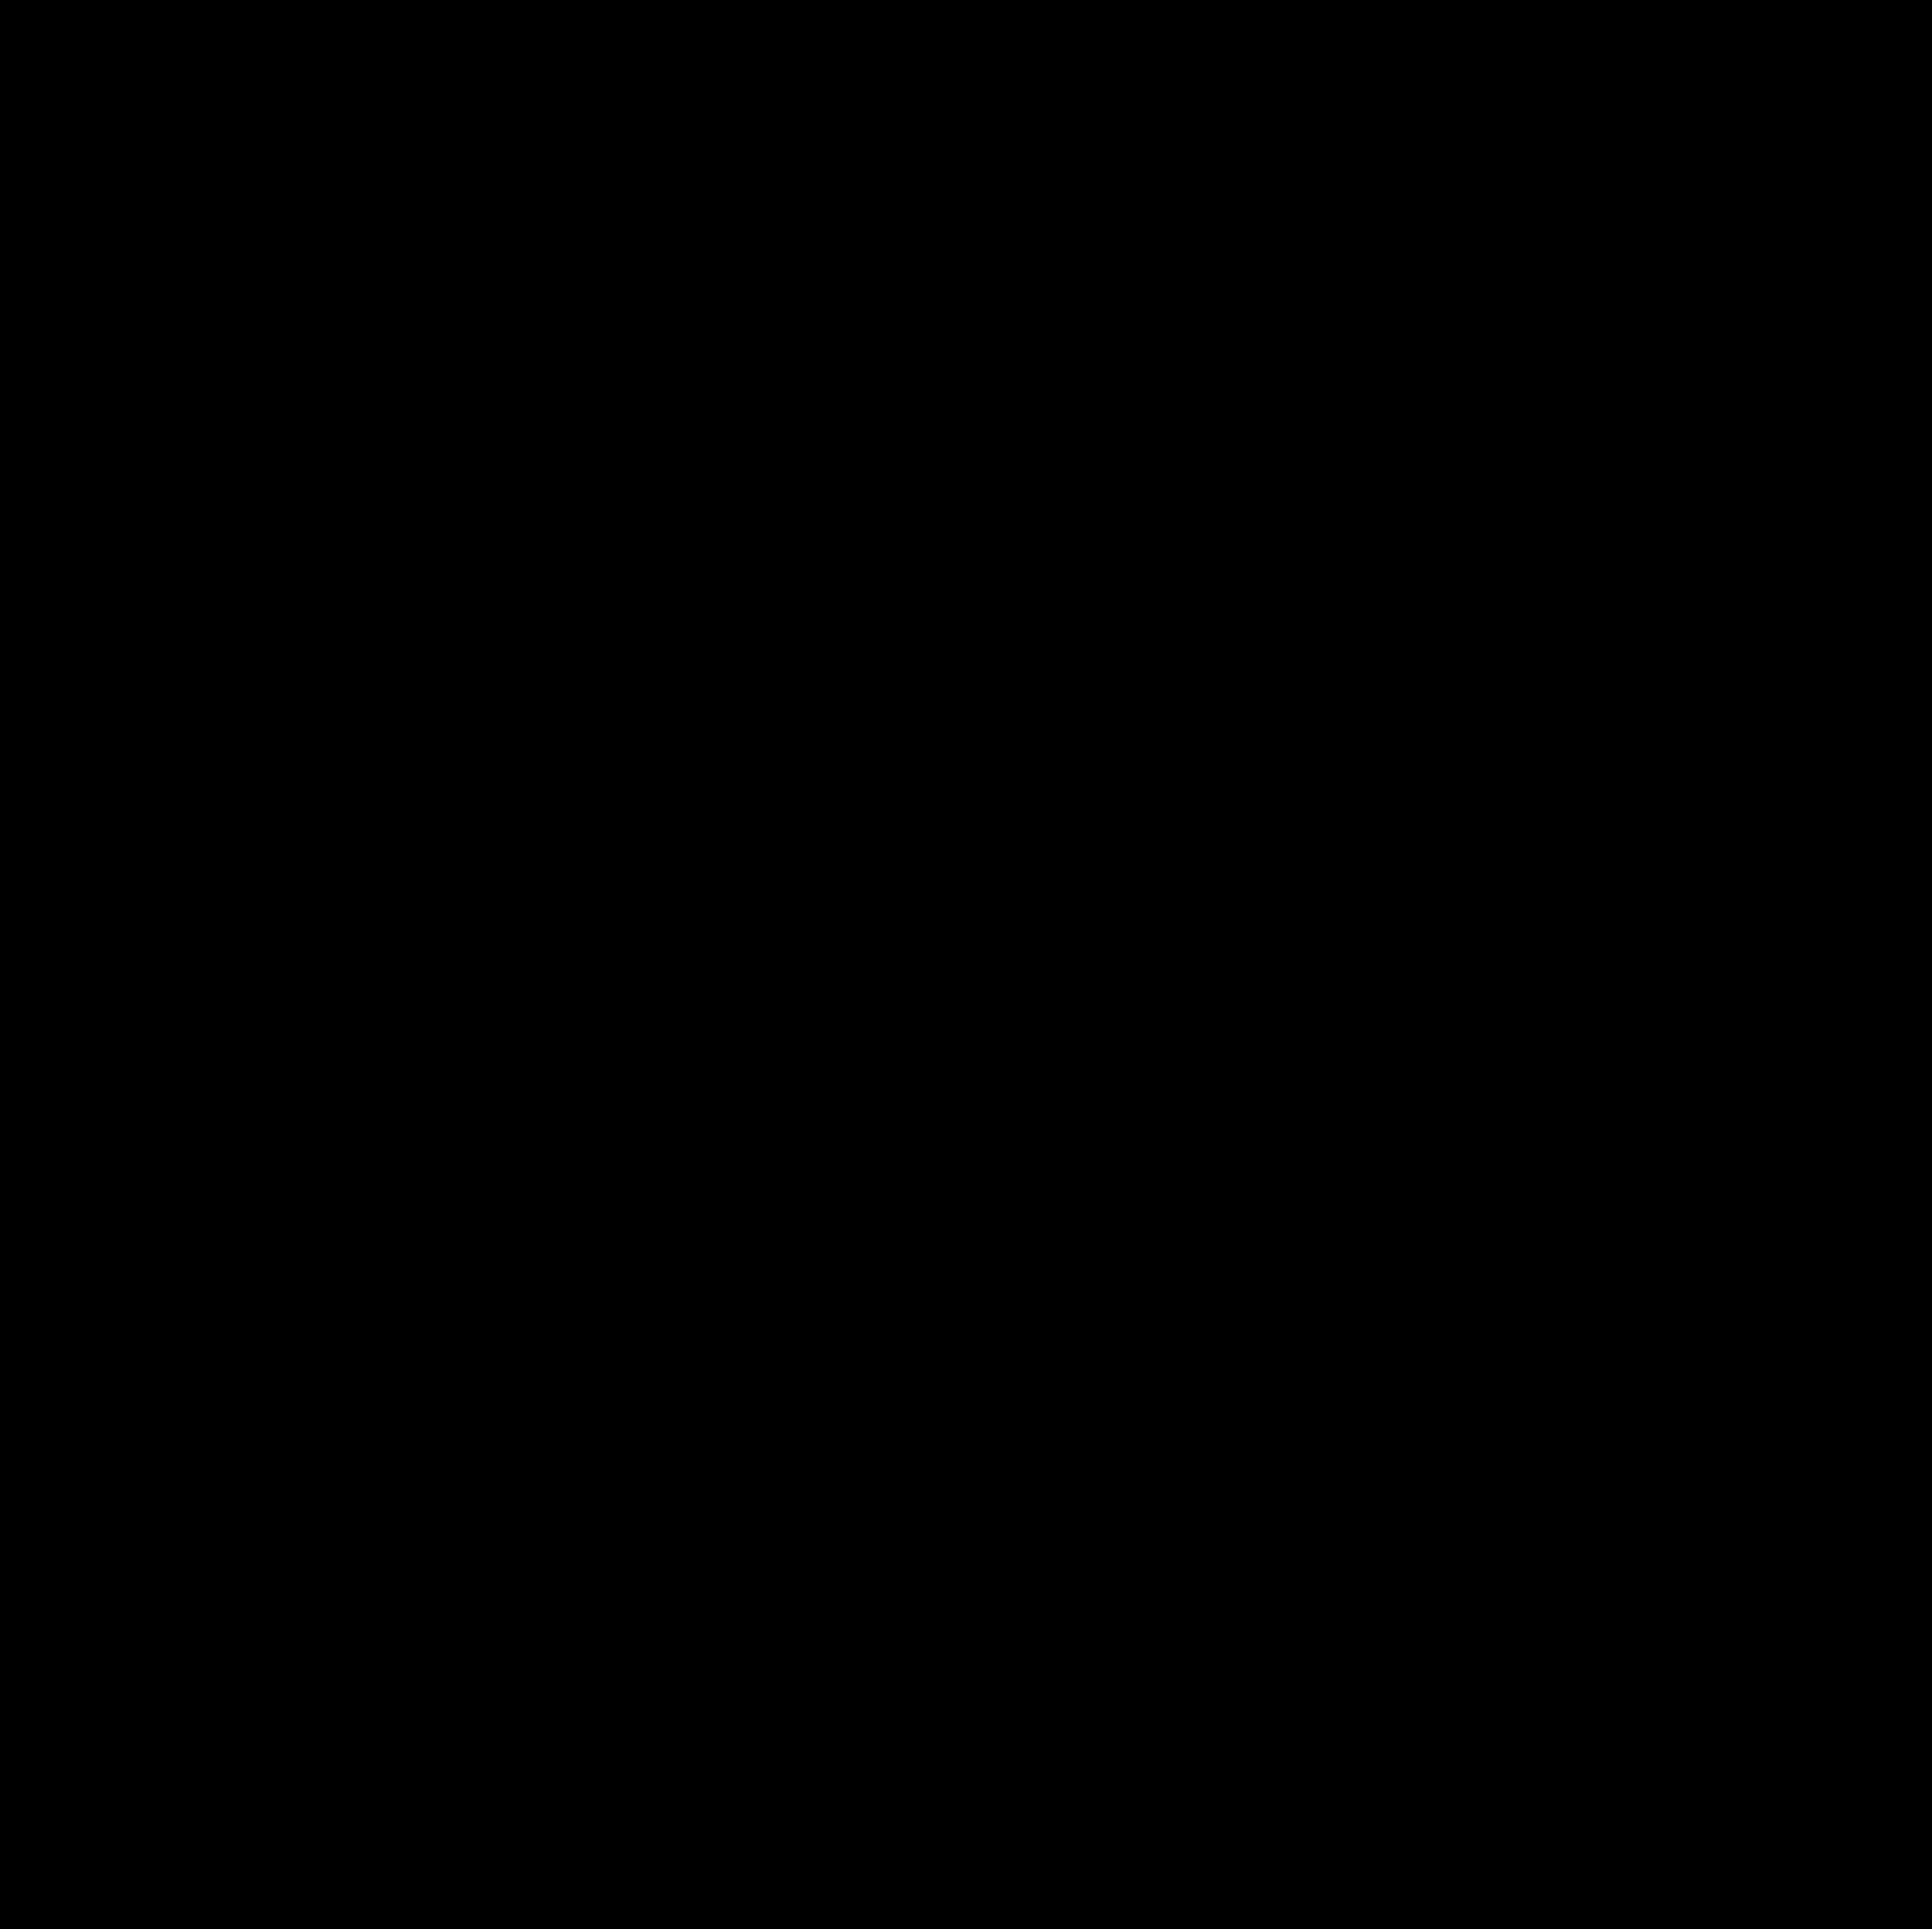 Black and white clipart flourish with sun graphic library stock Clipart - Silhouette Flourish Design 16 graphic library stock